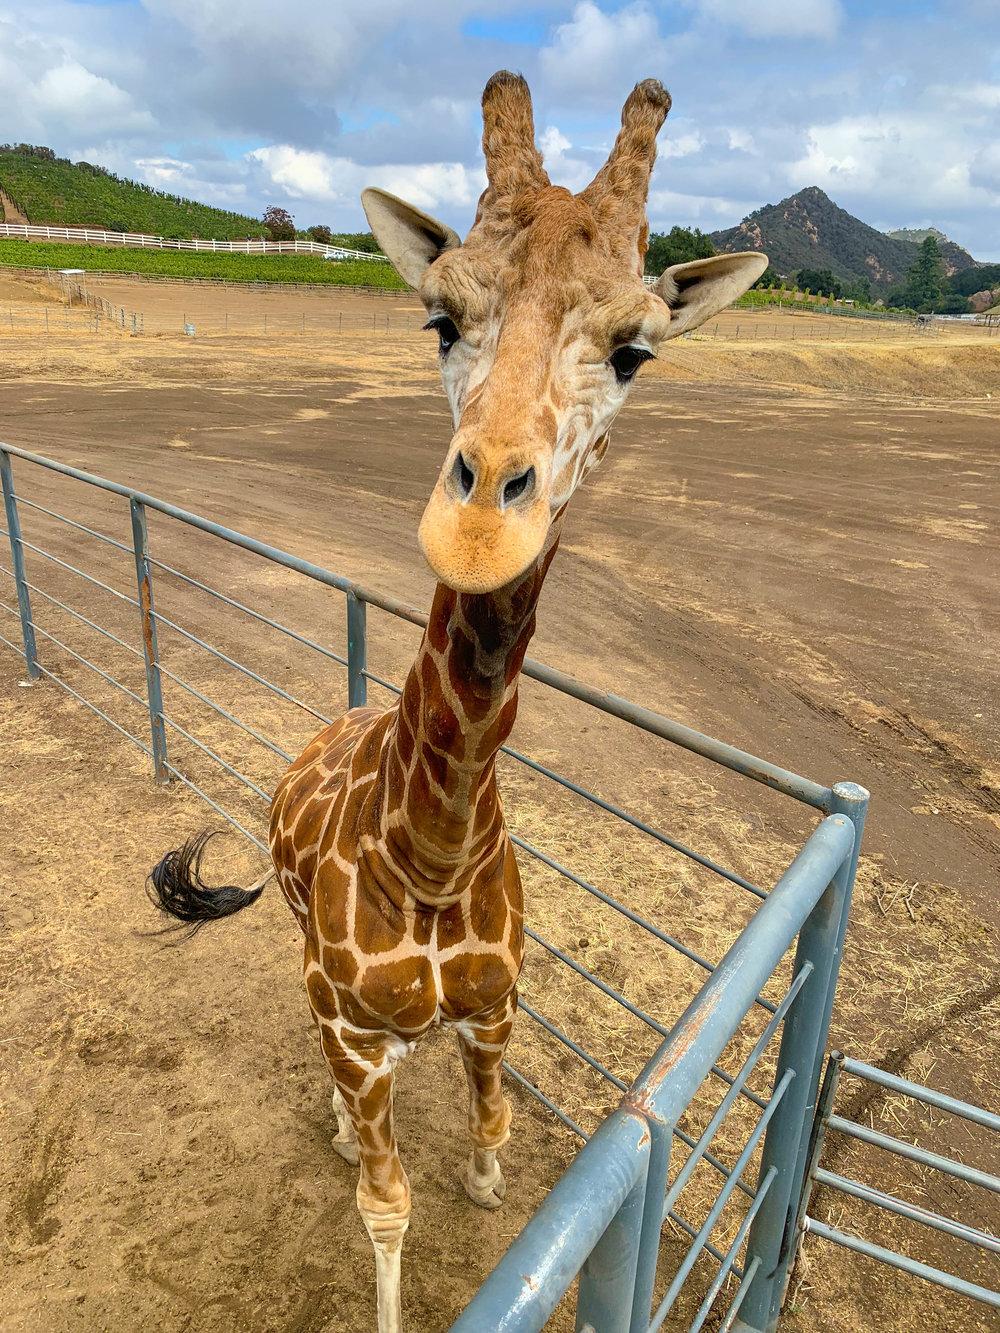 Malibu Wine Safari - Stanley the giraffe